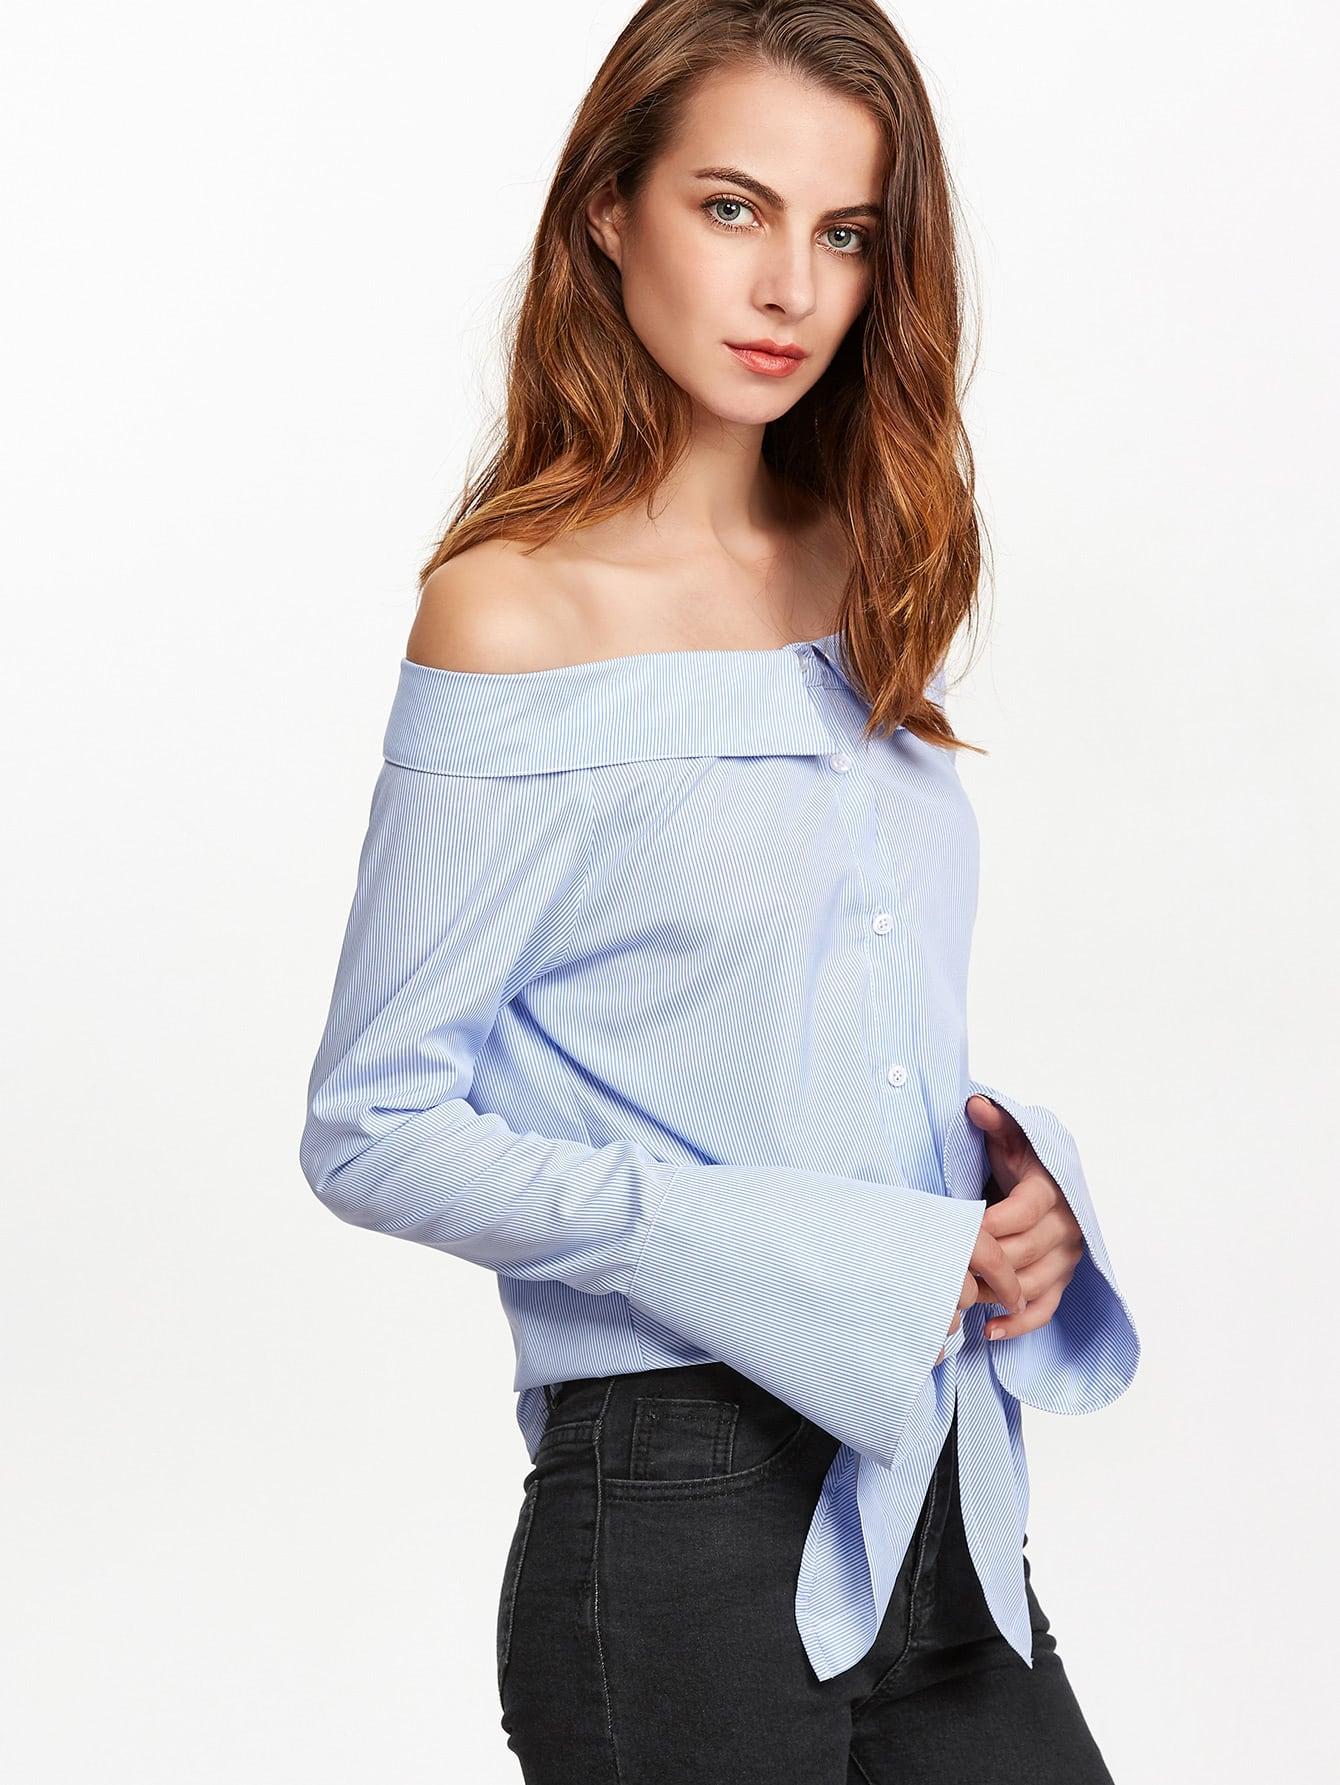 blouse161130714_2